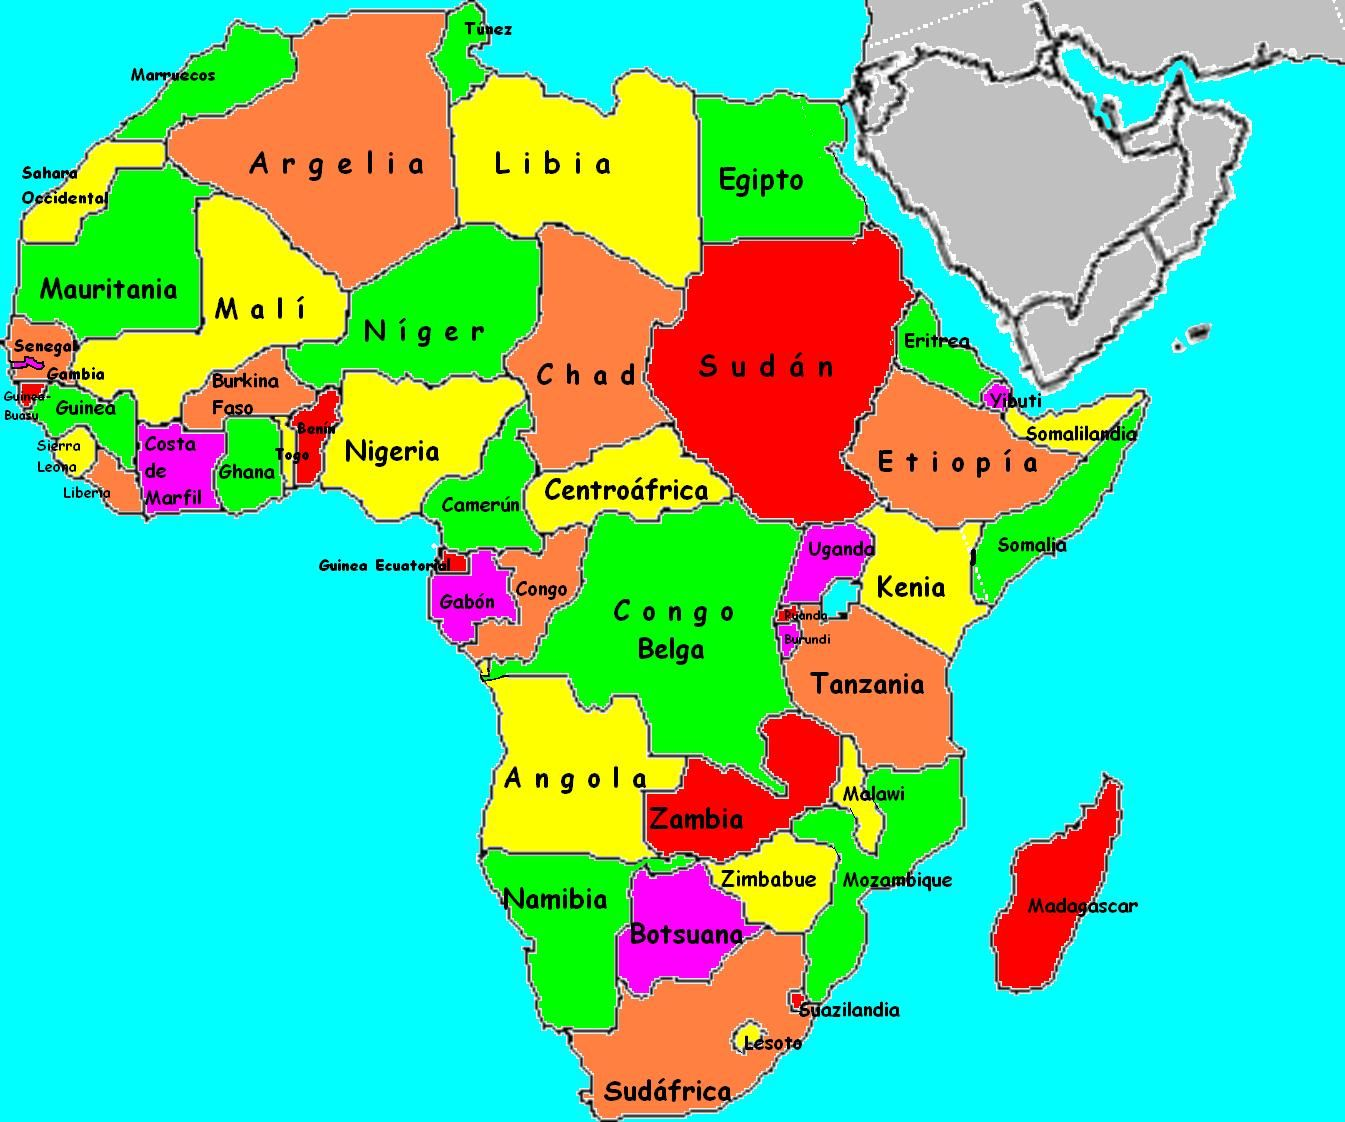 Mapa De Africa Grande Buscar Con Google Con Imagenes Africa